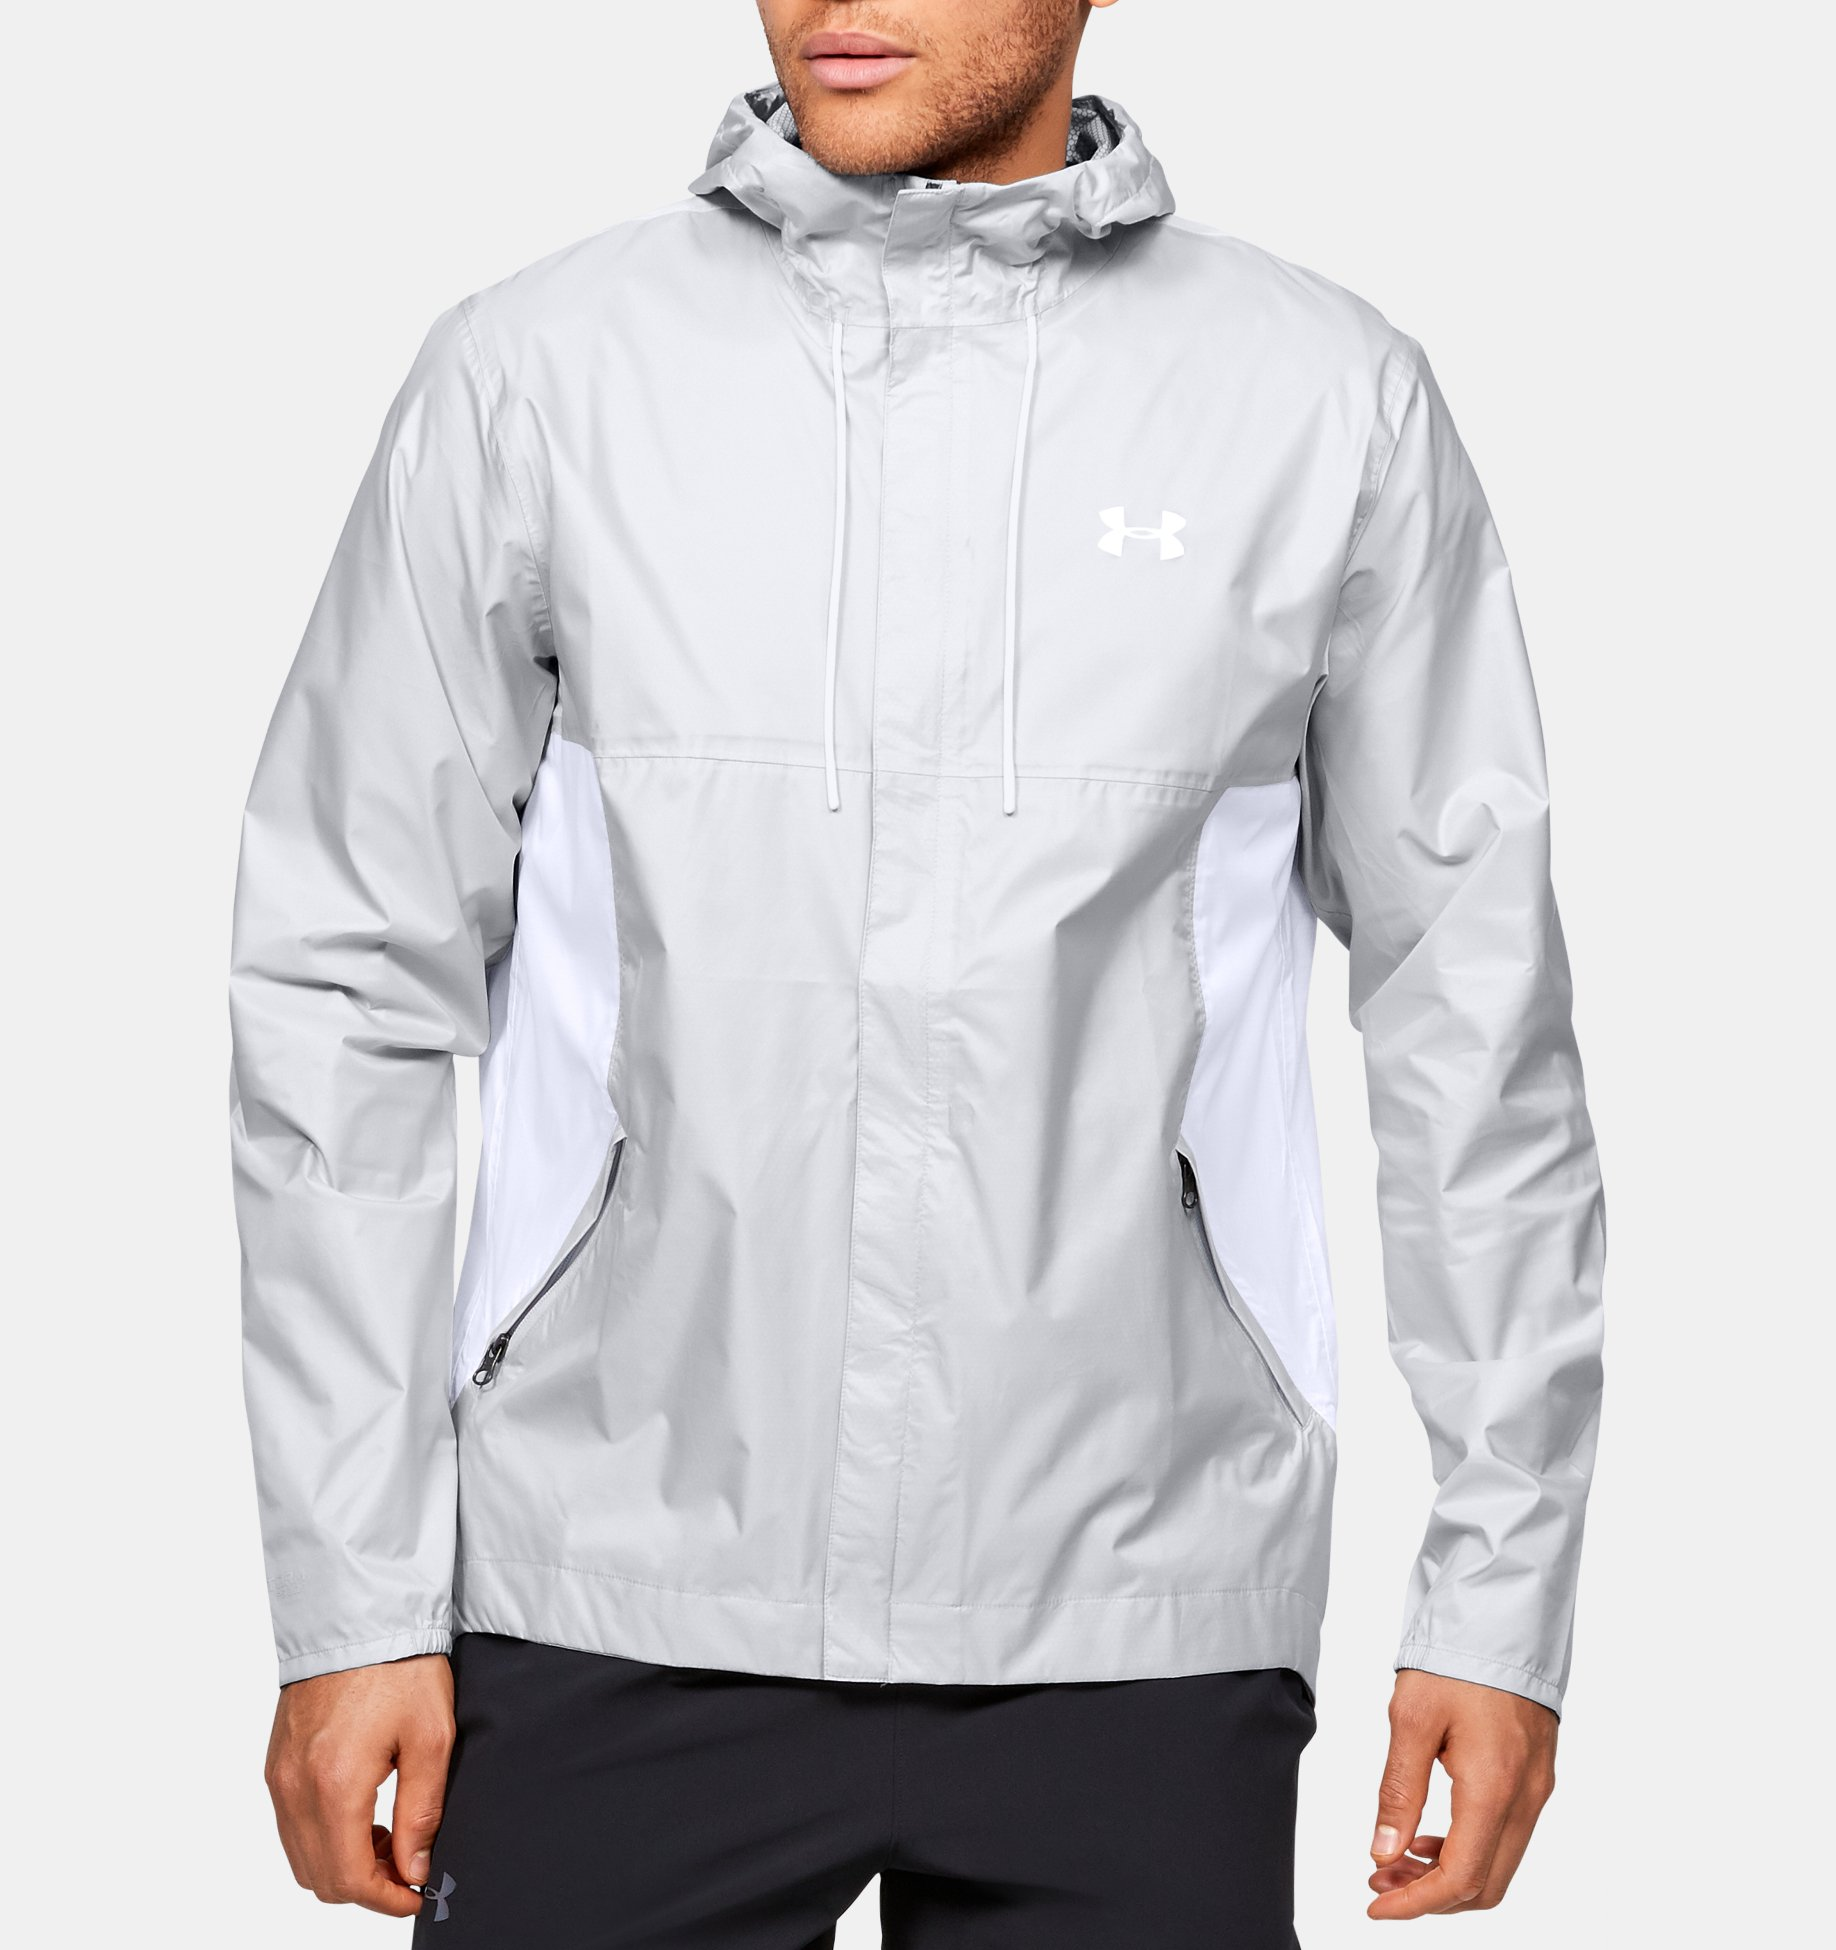 Underarmour Mens UA Cloudstrike Shell Jacket